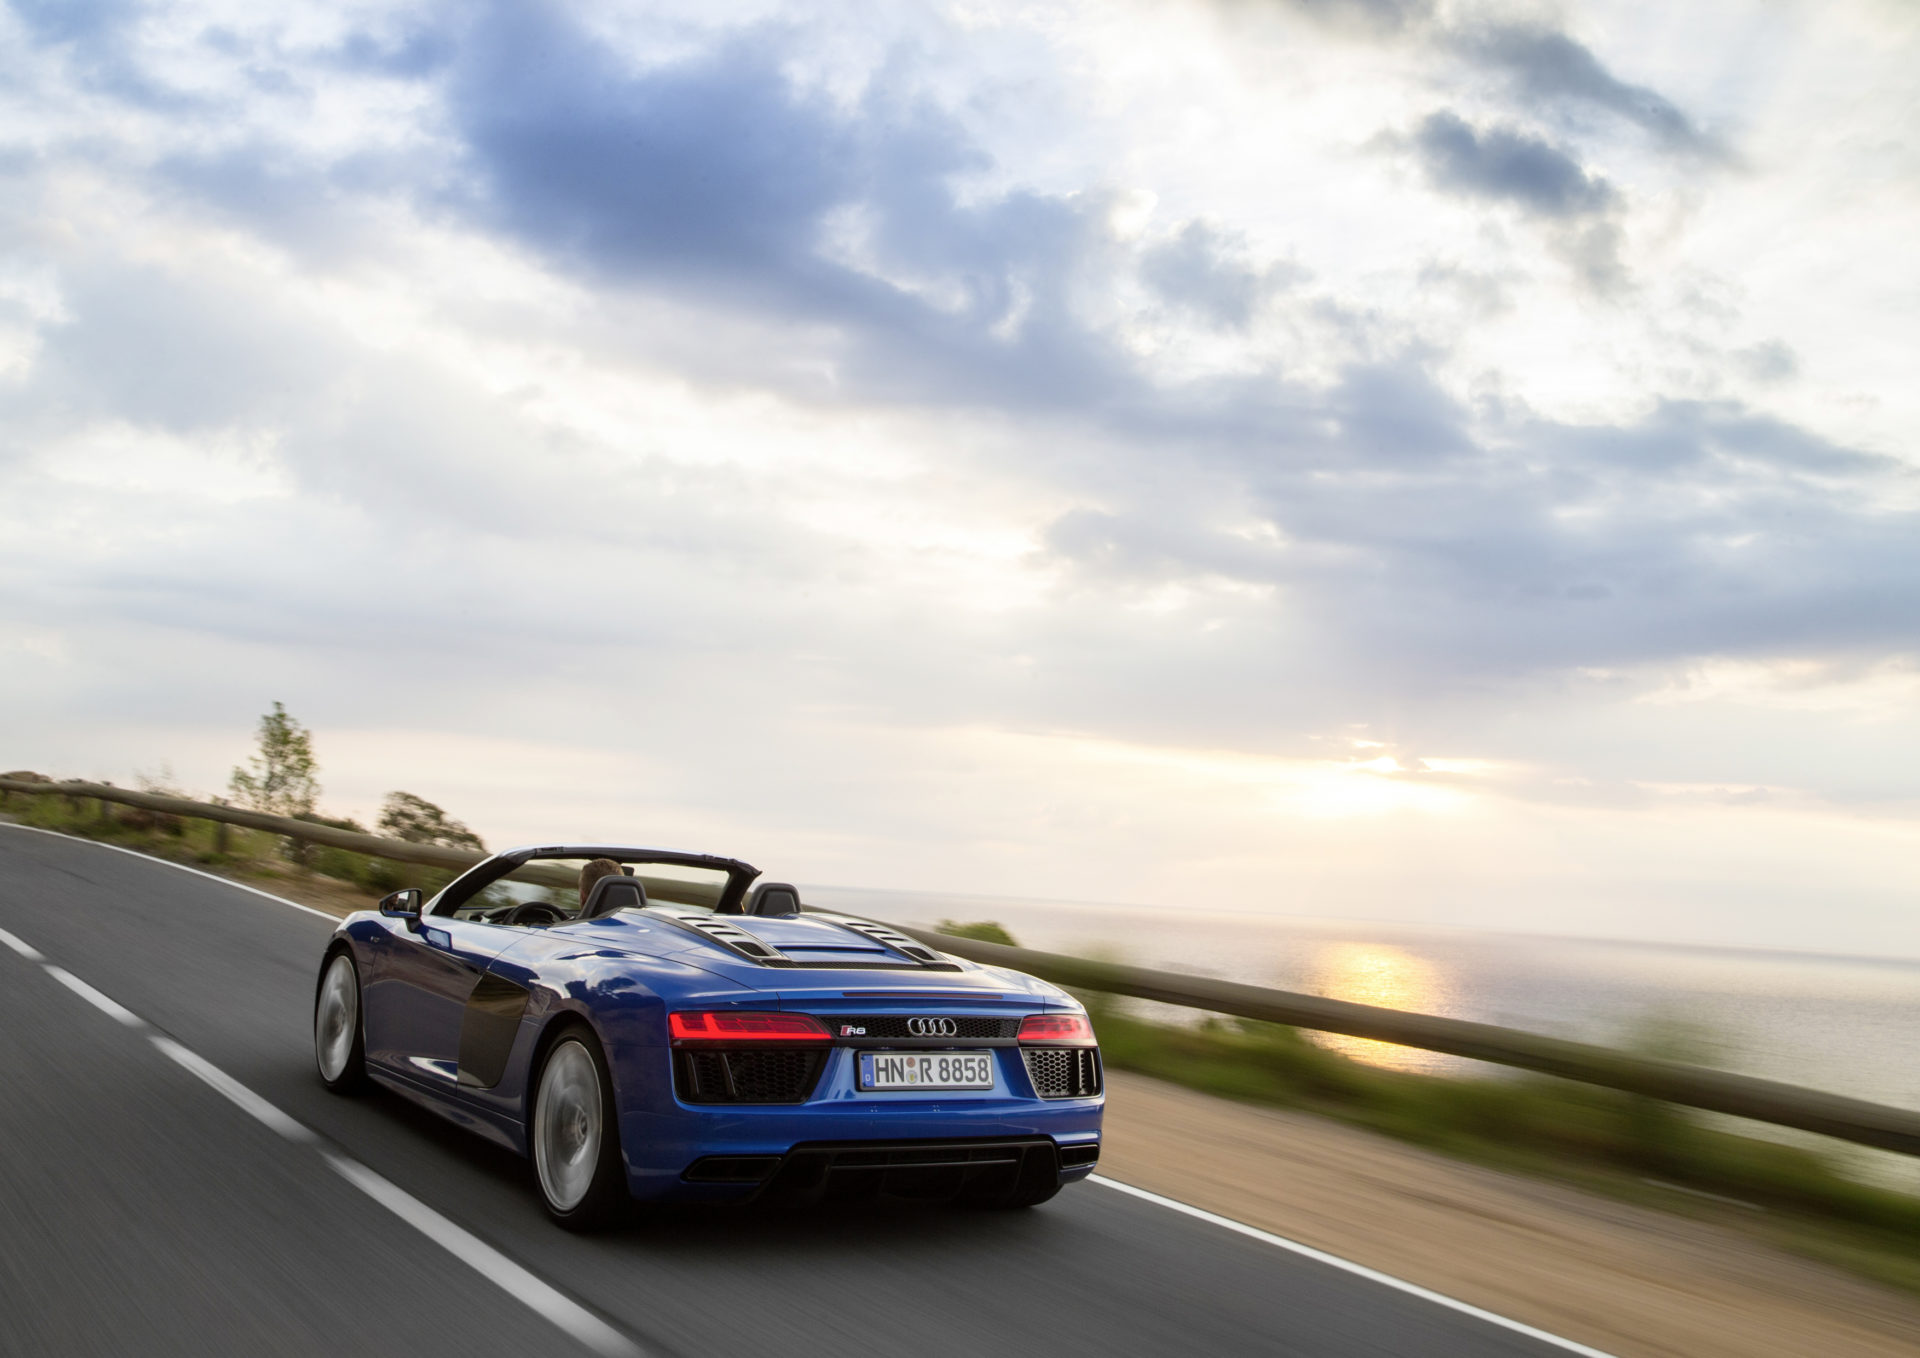 Which To Buy Bmw I8 Roadster Or Audi R8 V10 Spyder